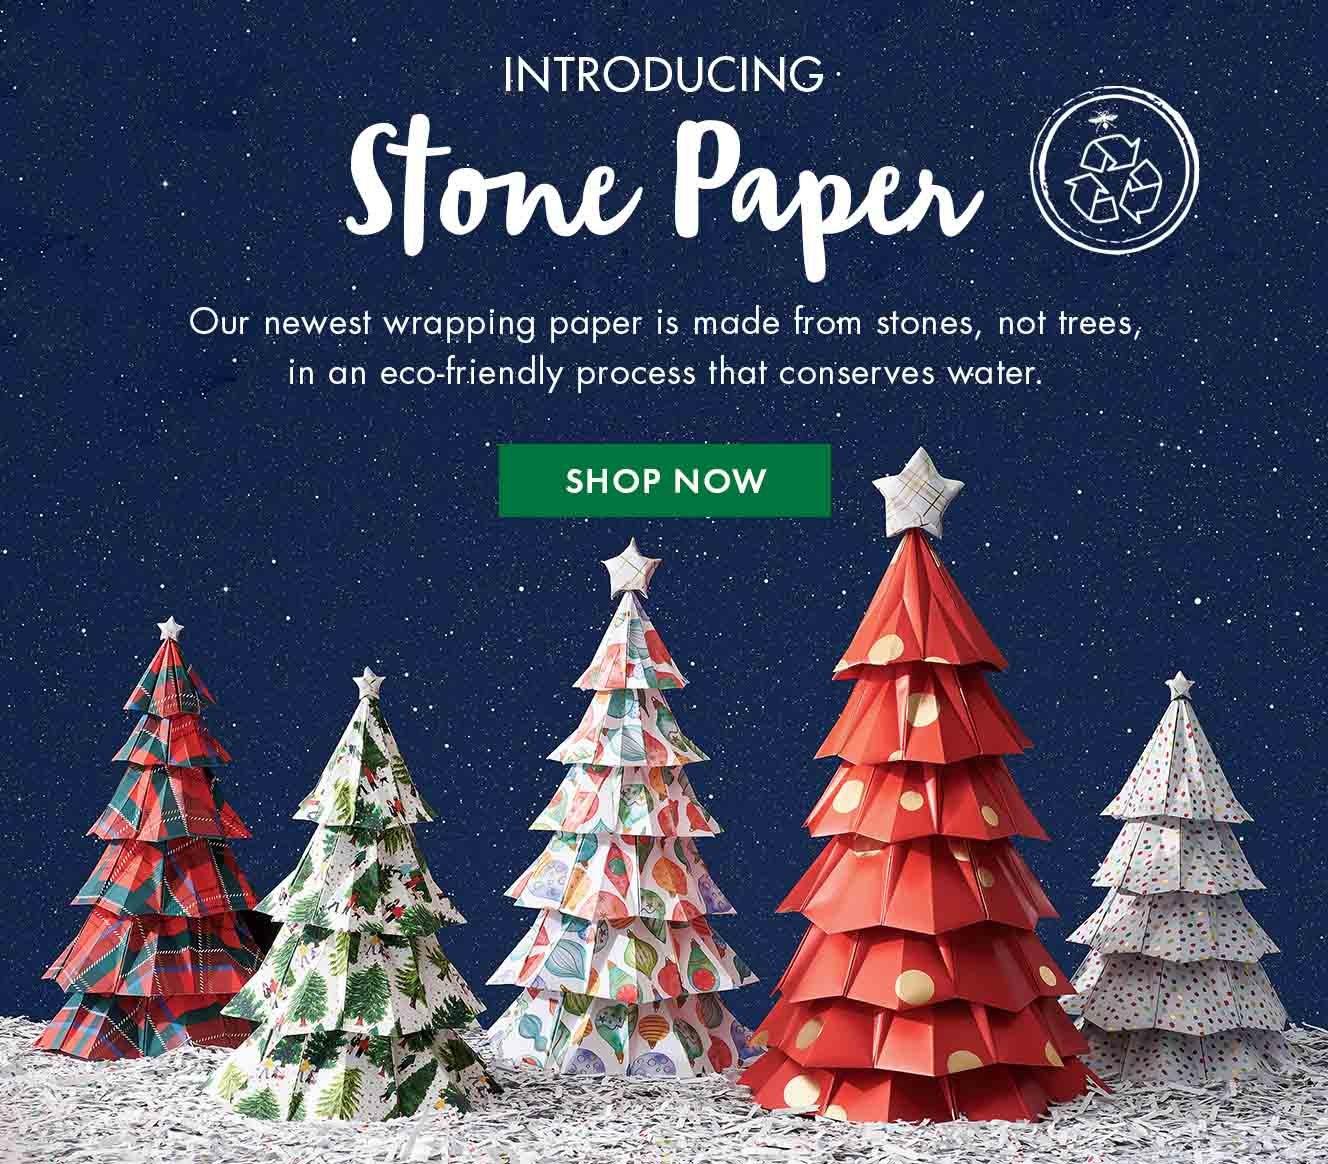 Stone Paper